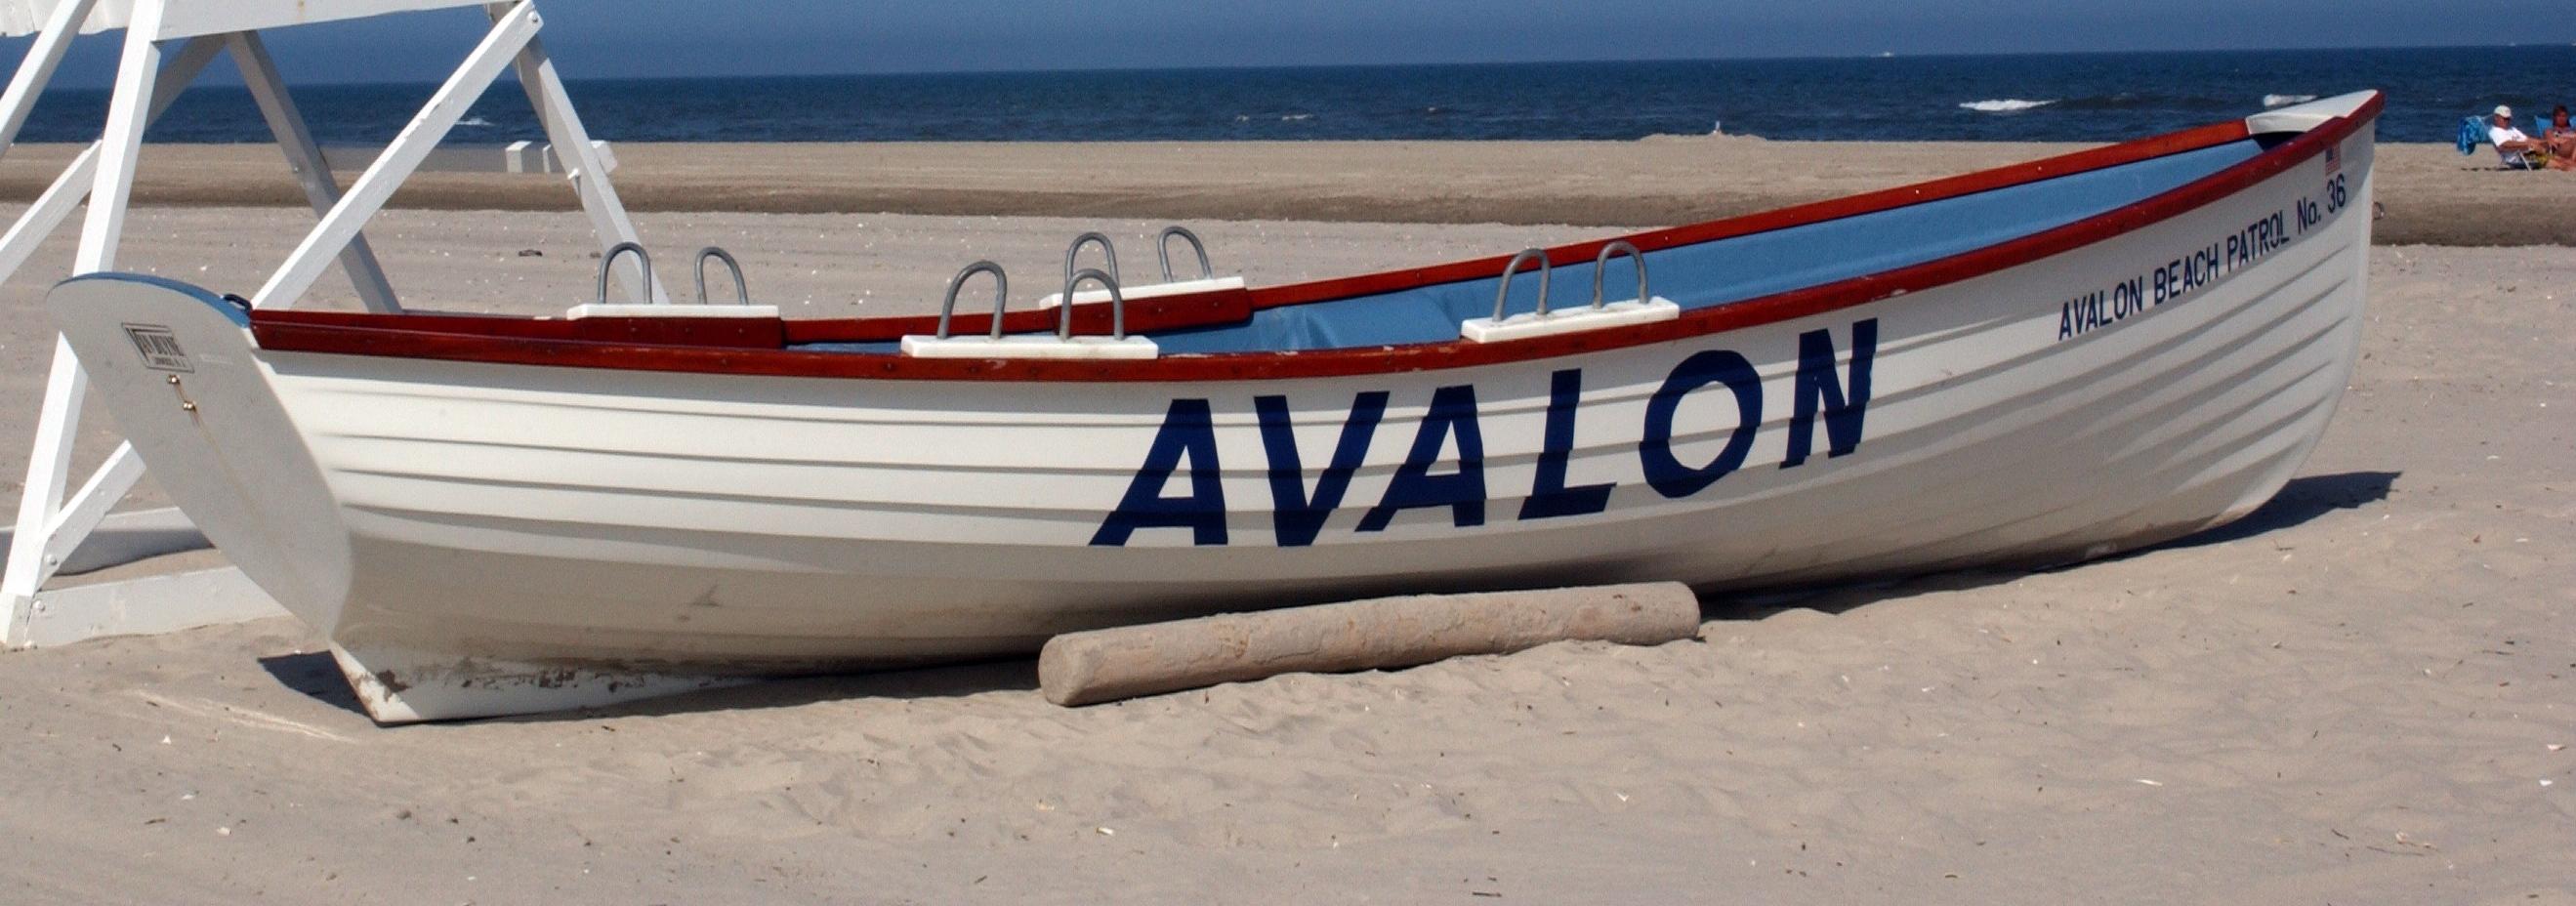 Avalon Beach Information